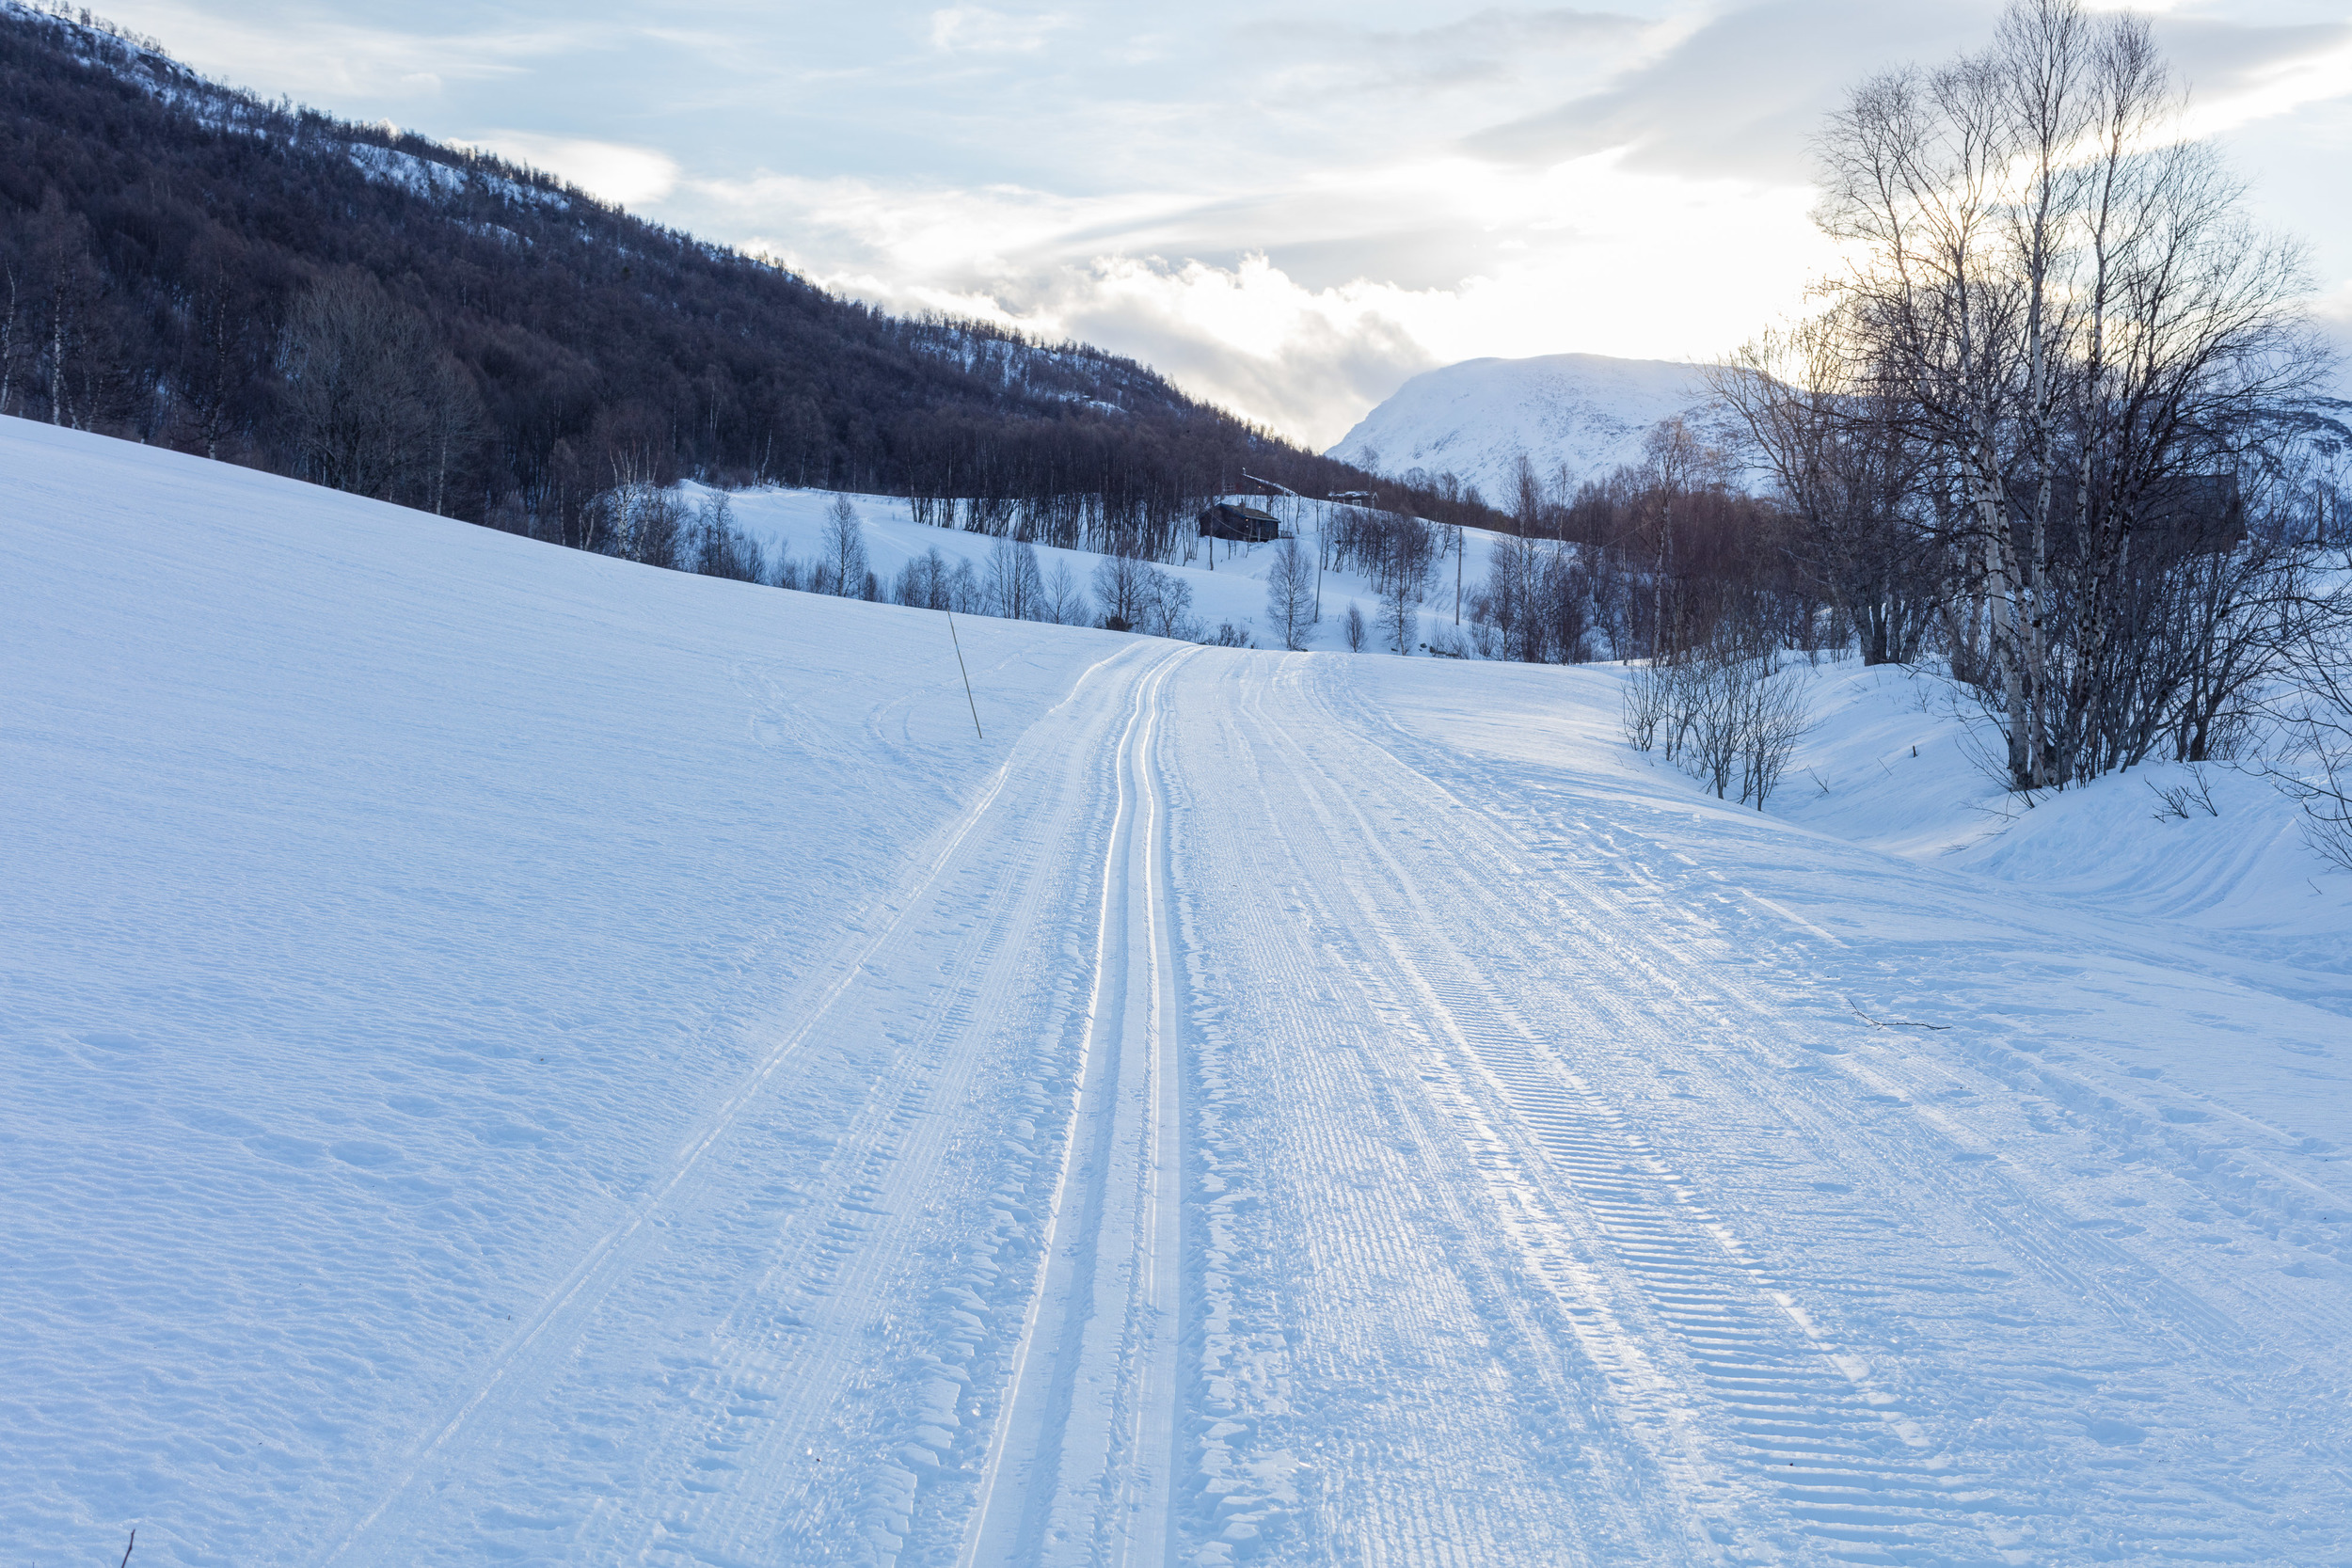 Bortistu-Storlidalen-Oppdal-Norge-Sven-Erik-Knoff-FotoKnoff-71.jpg